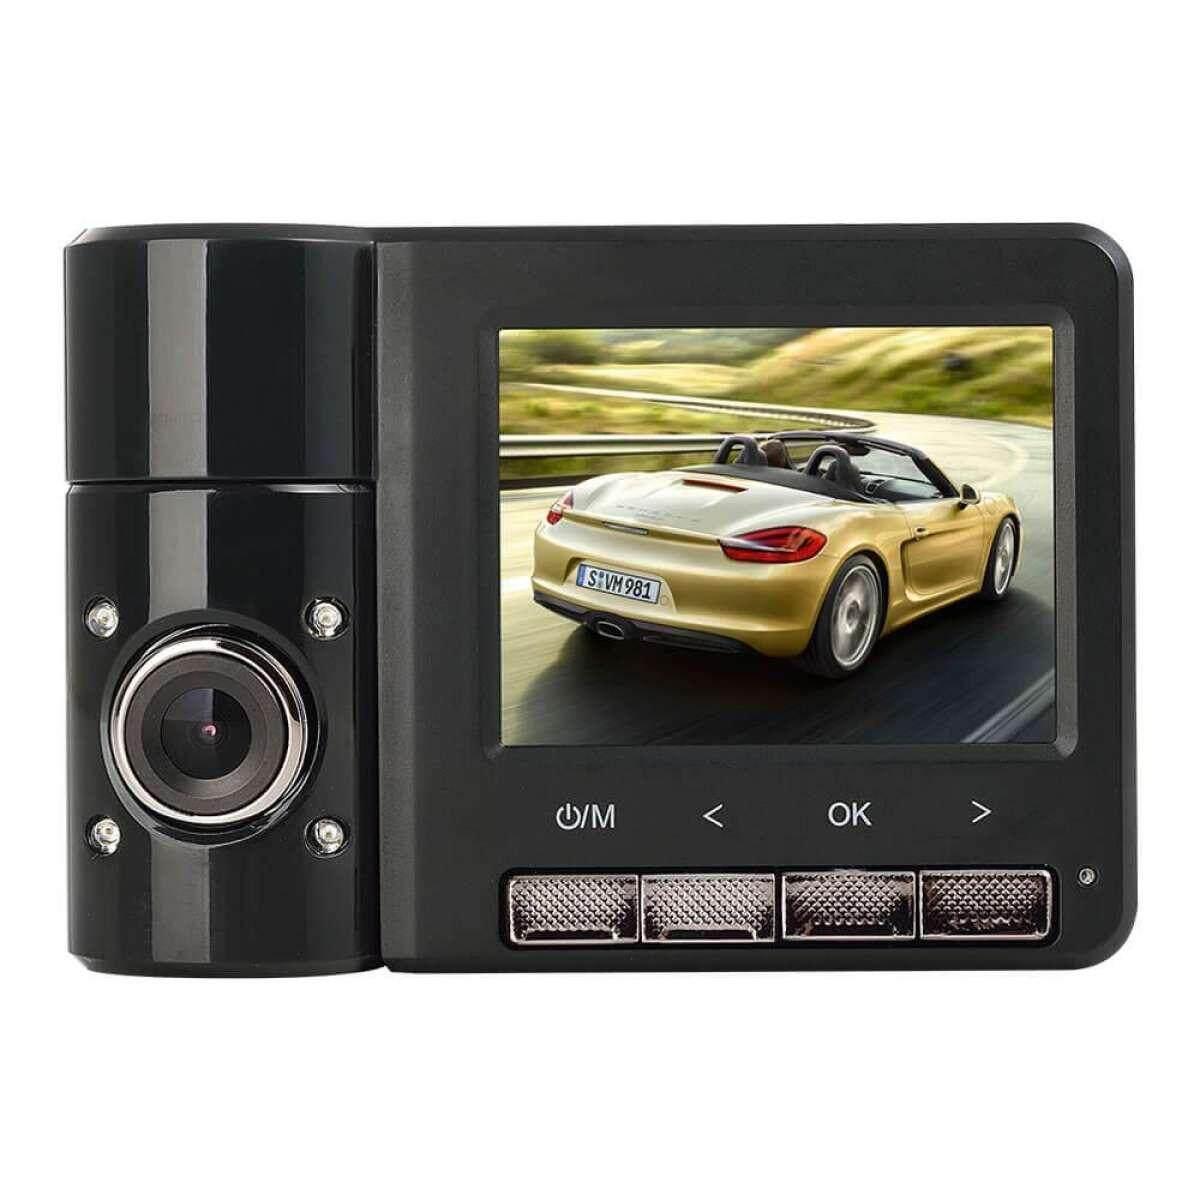 [Grab Driver Exclusive] ANYTEK B60 Dual Lens Camcorder 1080p HD Car Dash Video Driving Car Recorder DVR